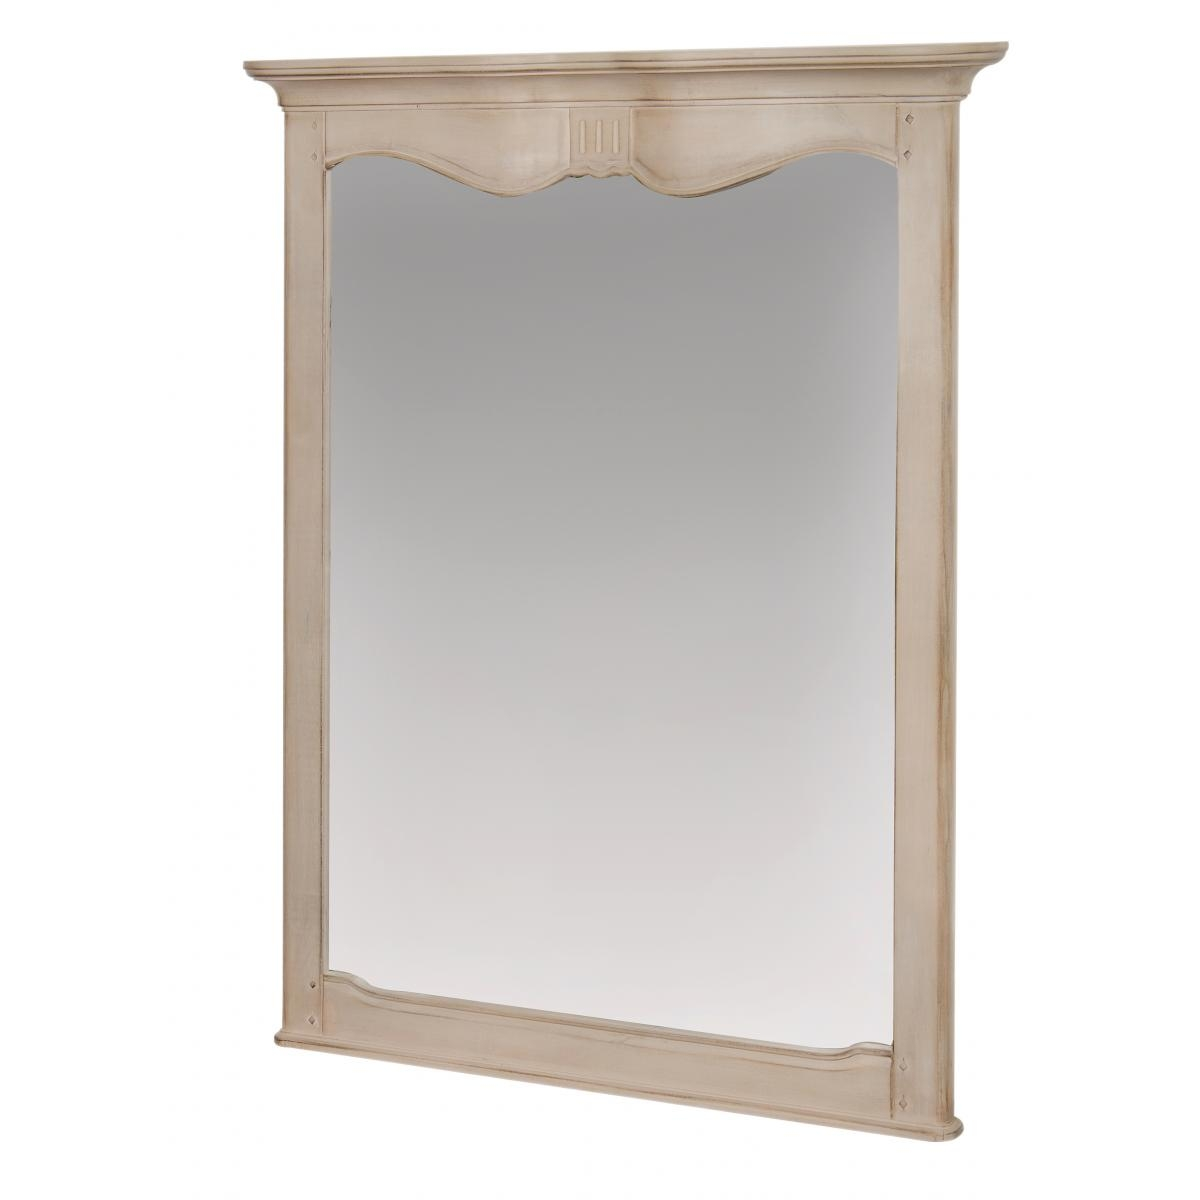 Oglinda decorativa din lemn de mesteacan, Venezia VE816K imagine